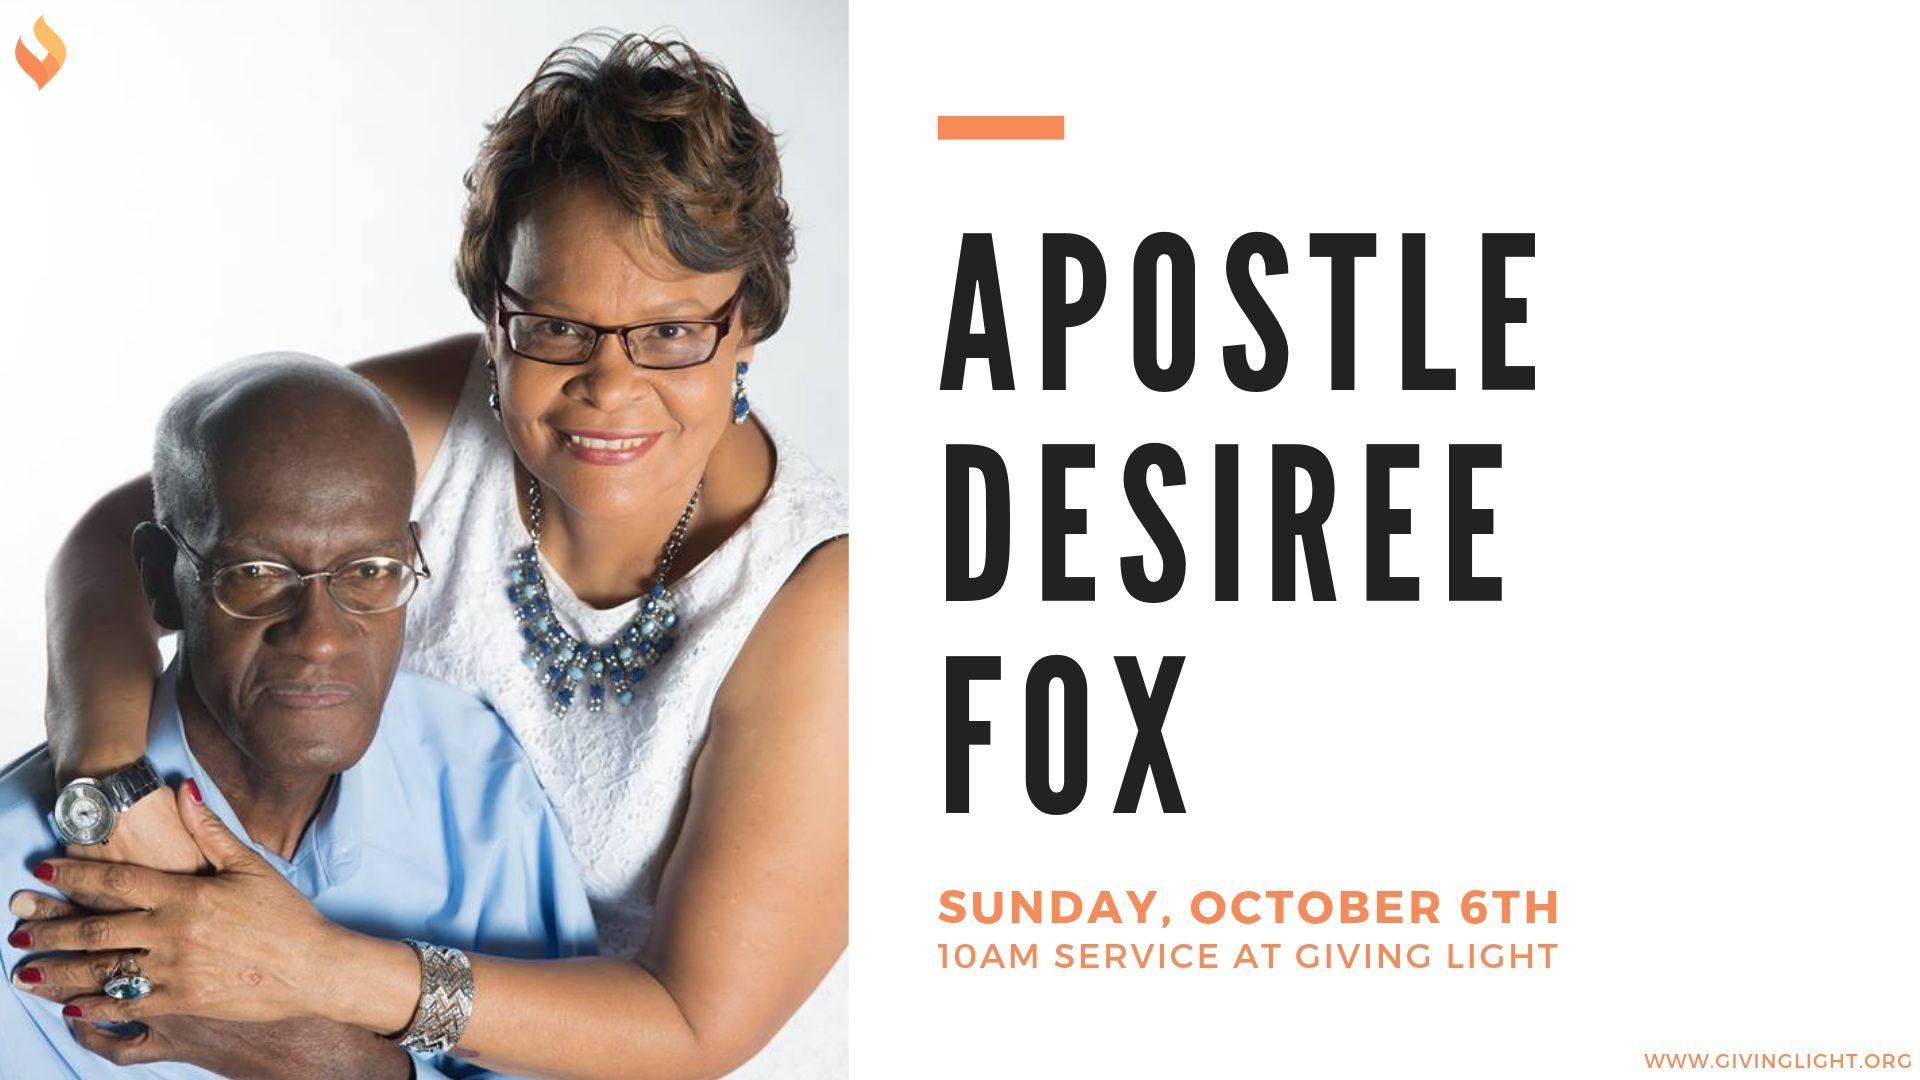 Sunday AM Service with Apostle Desiree Fox - GIVING LIGHT